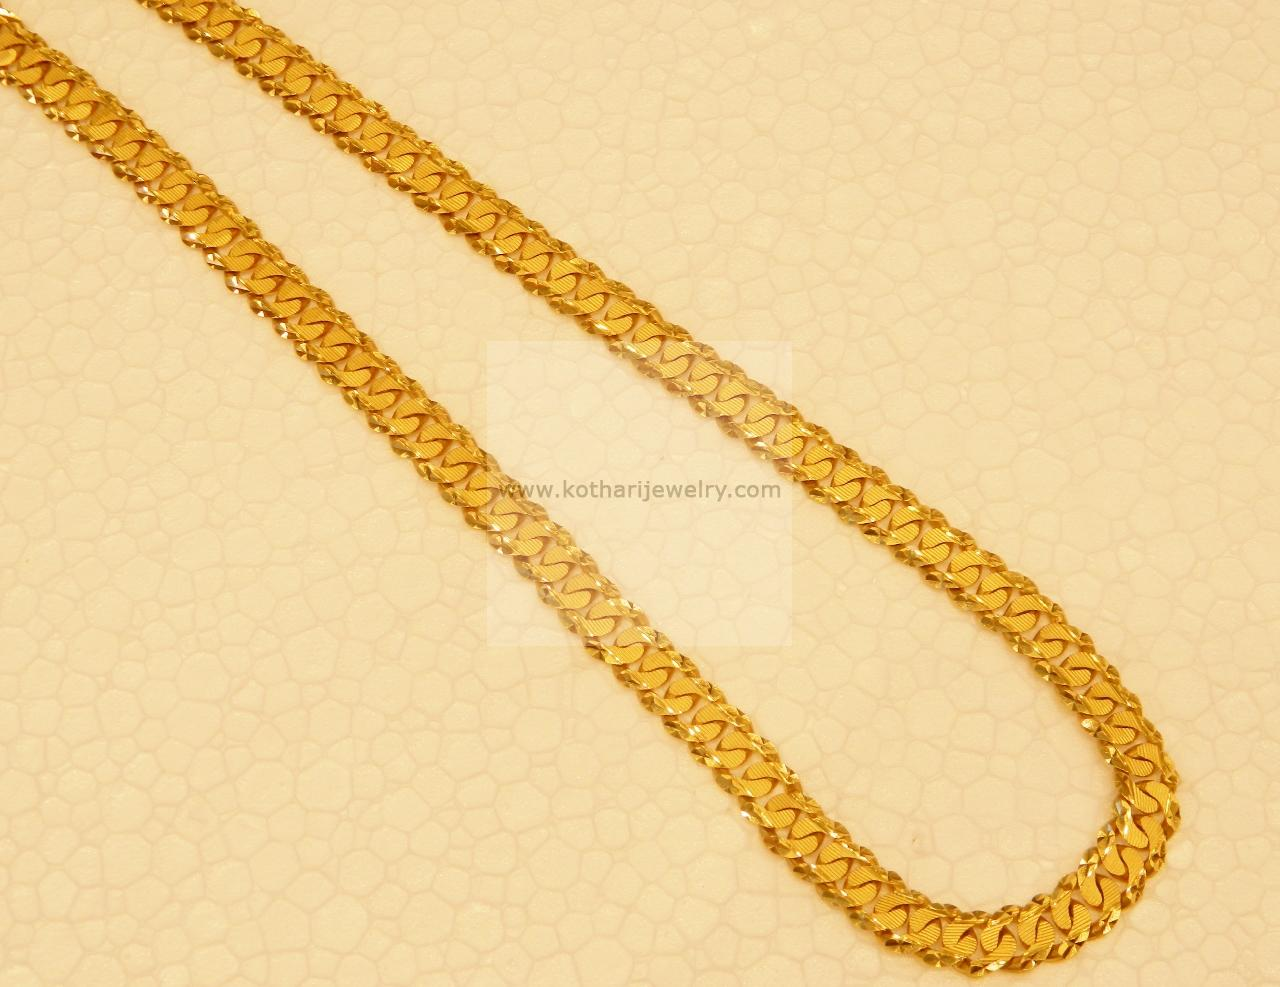 Gold Necklace Designs In Sri Lanka | myideasbedroom.com